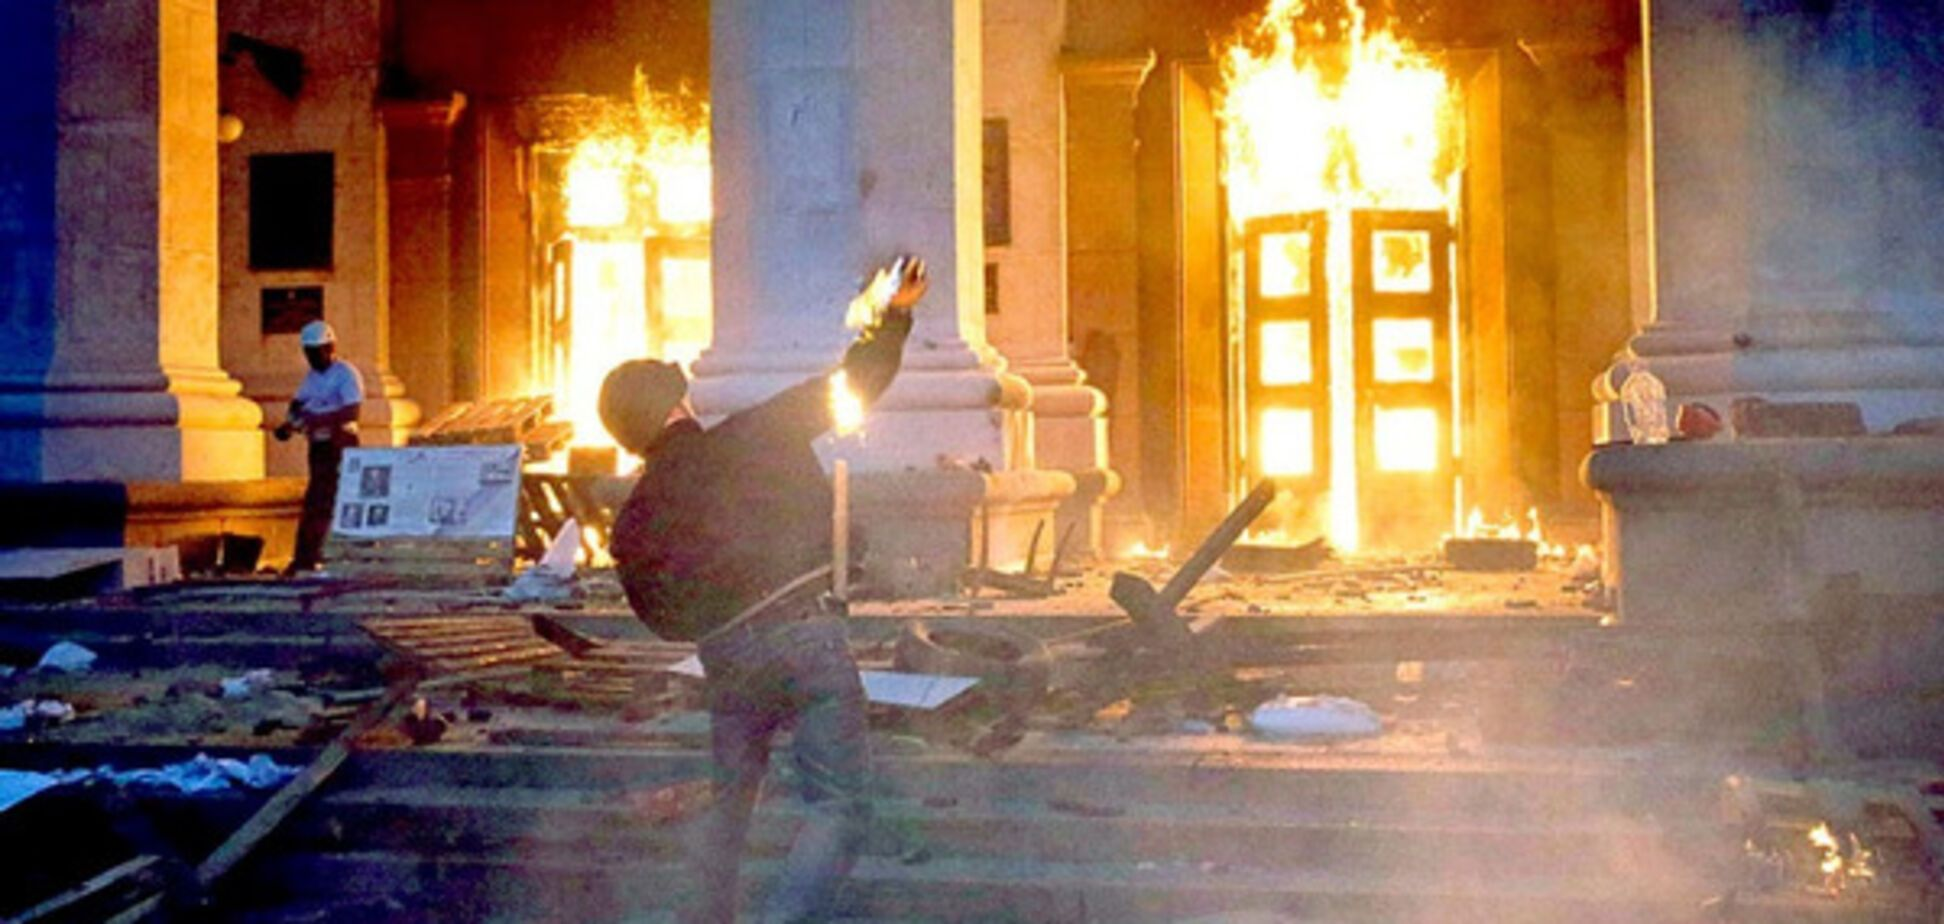 Одесса. Пожар в Доме профсоюзов